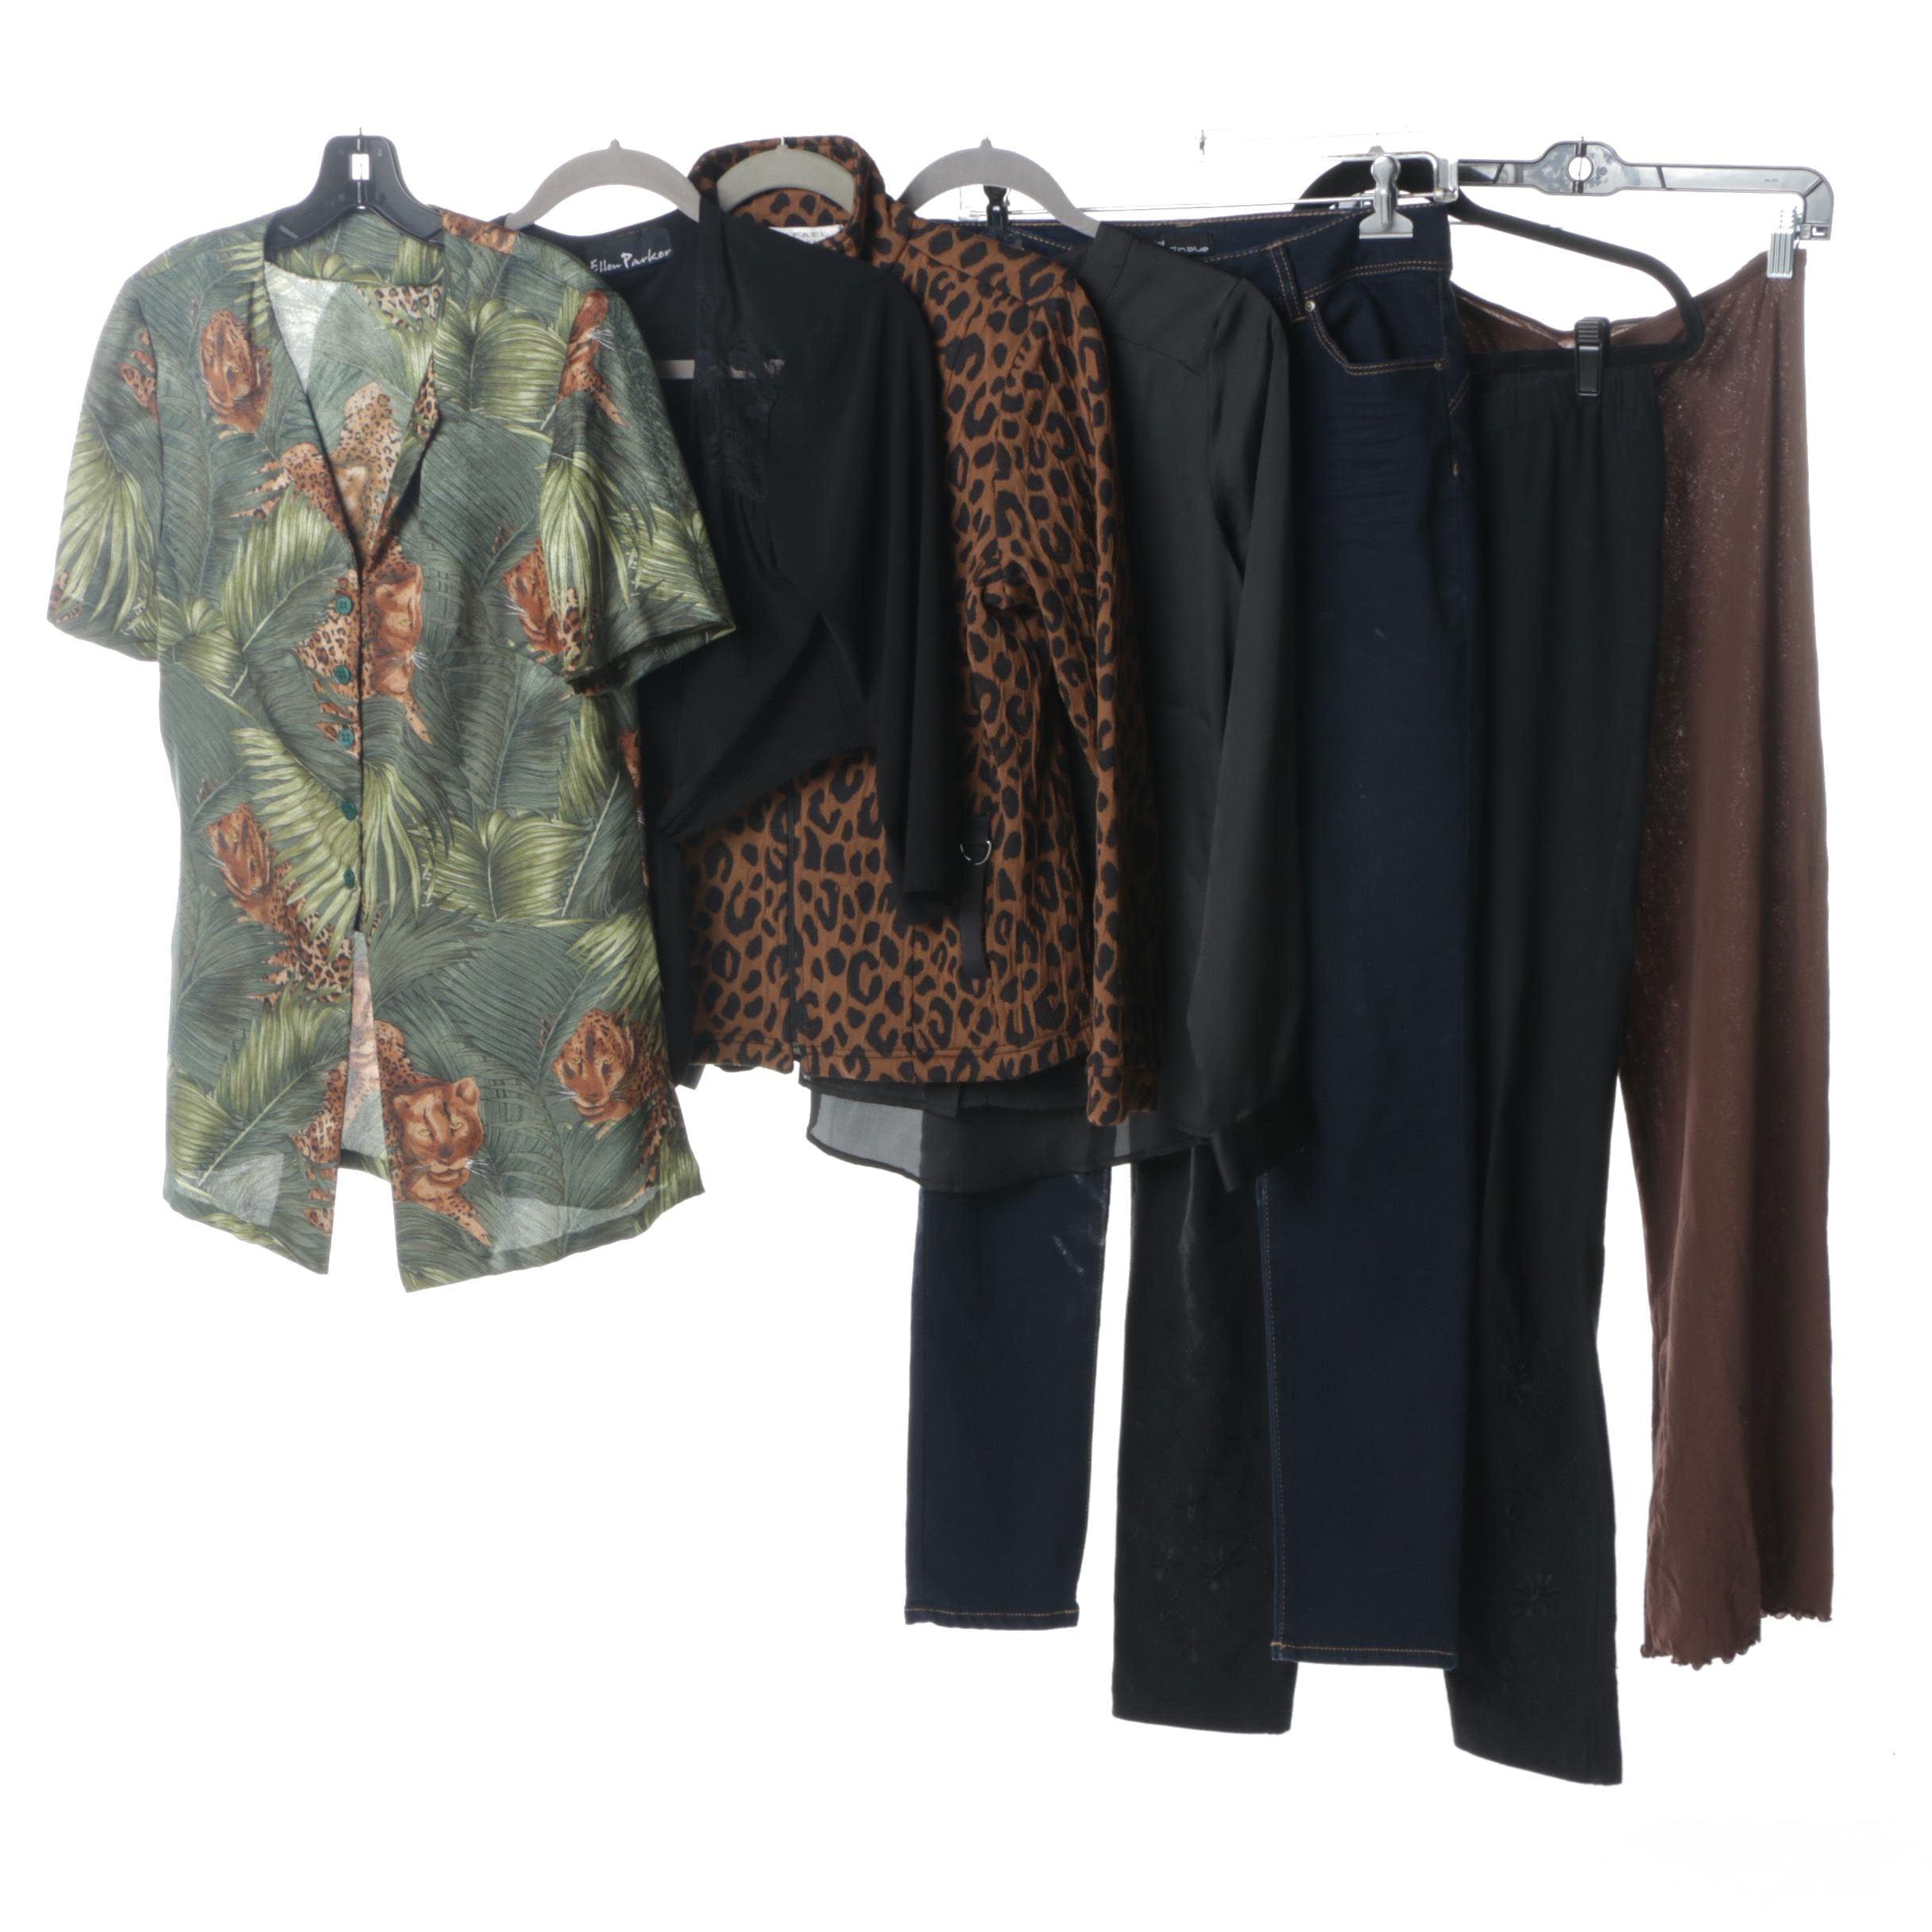 Women's Clothing, Including Ellen Parker